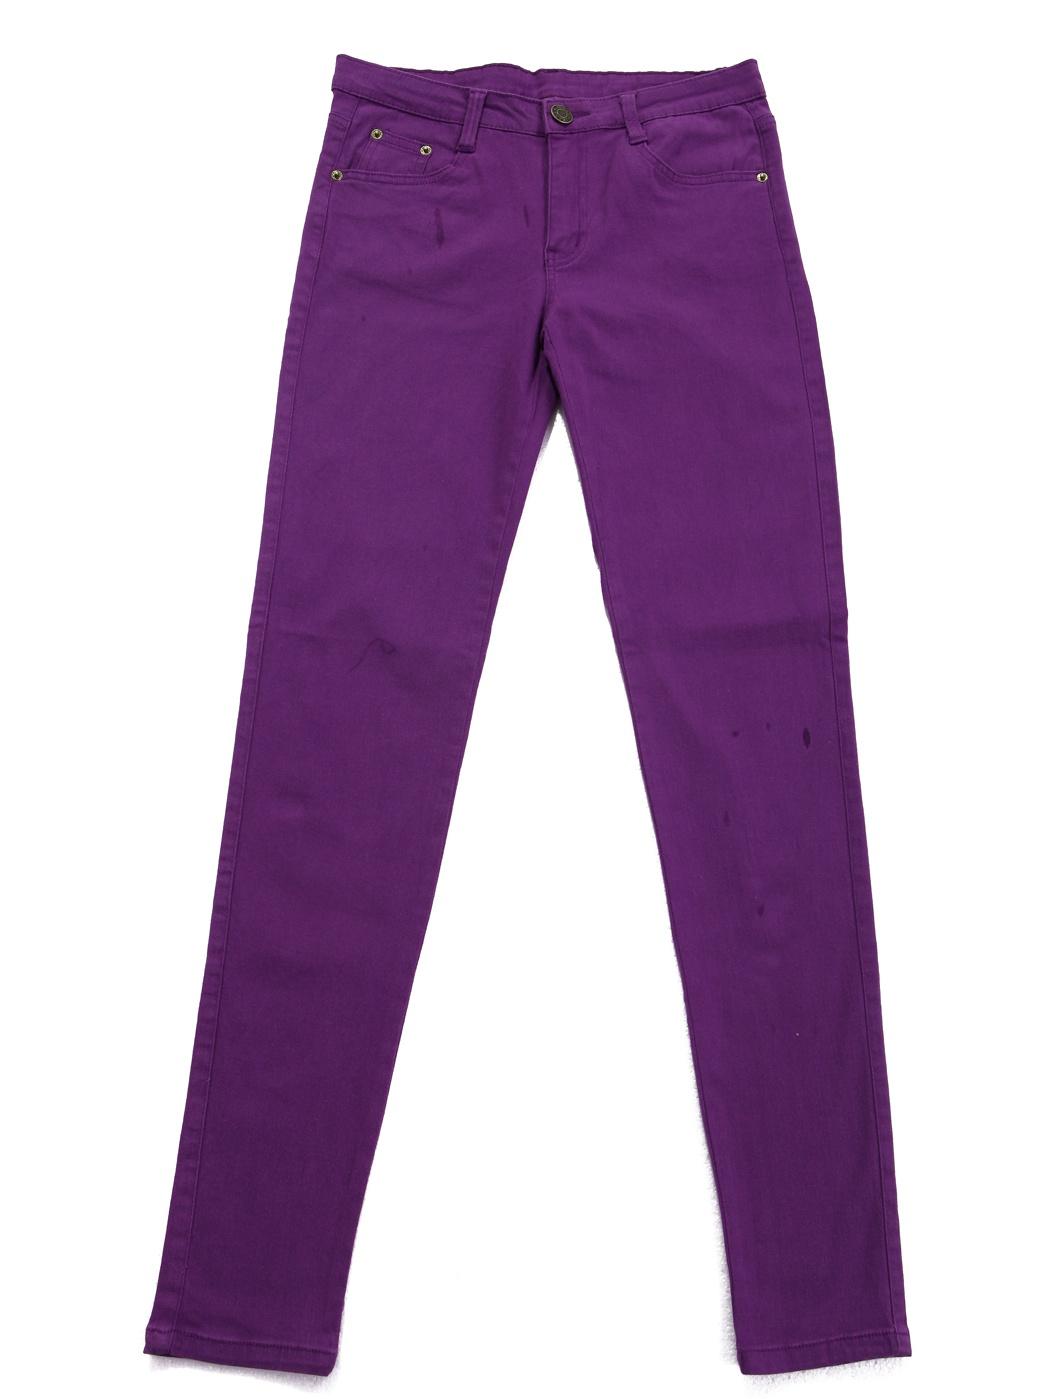 HDE Women's Jeans Jeggings Five Pocket Stretch Denim Basic Slim Fit Skinny Pants